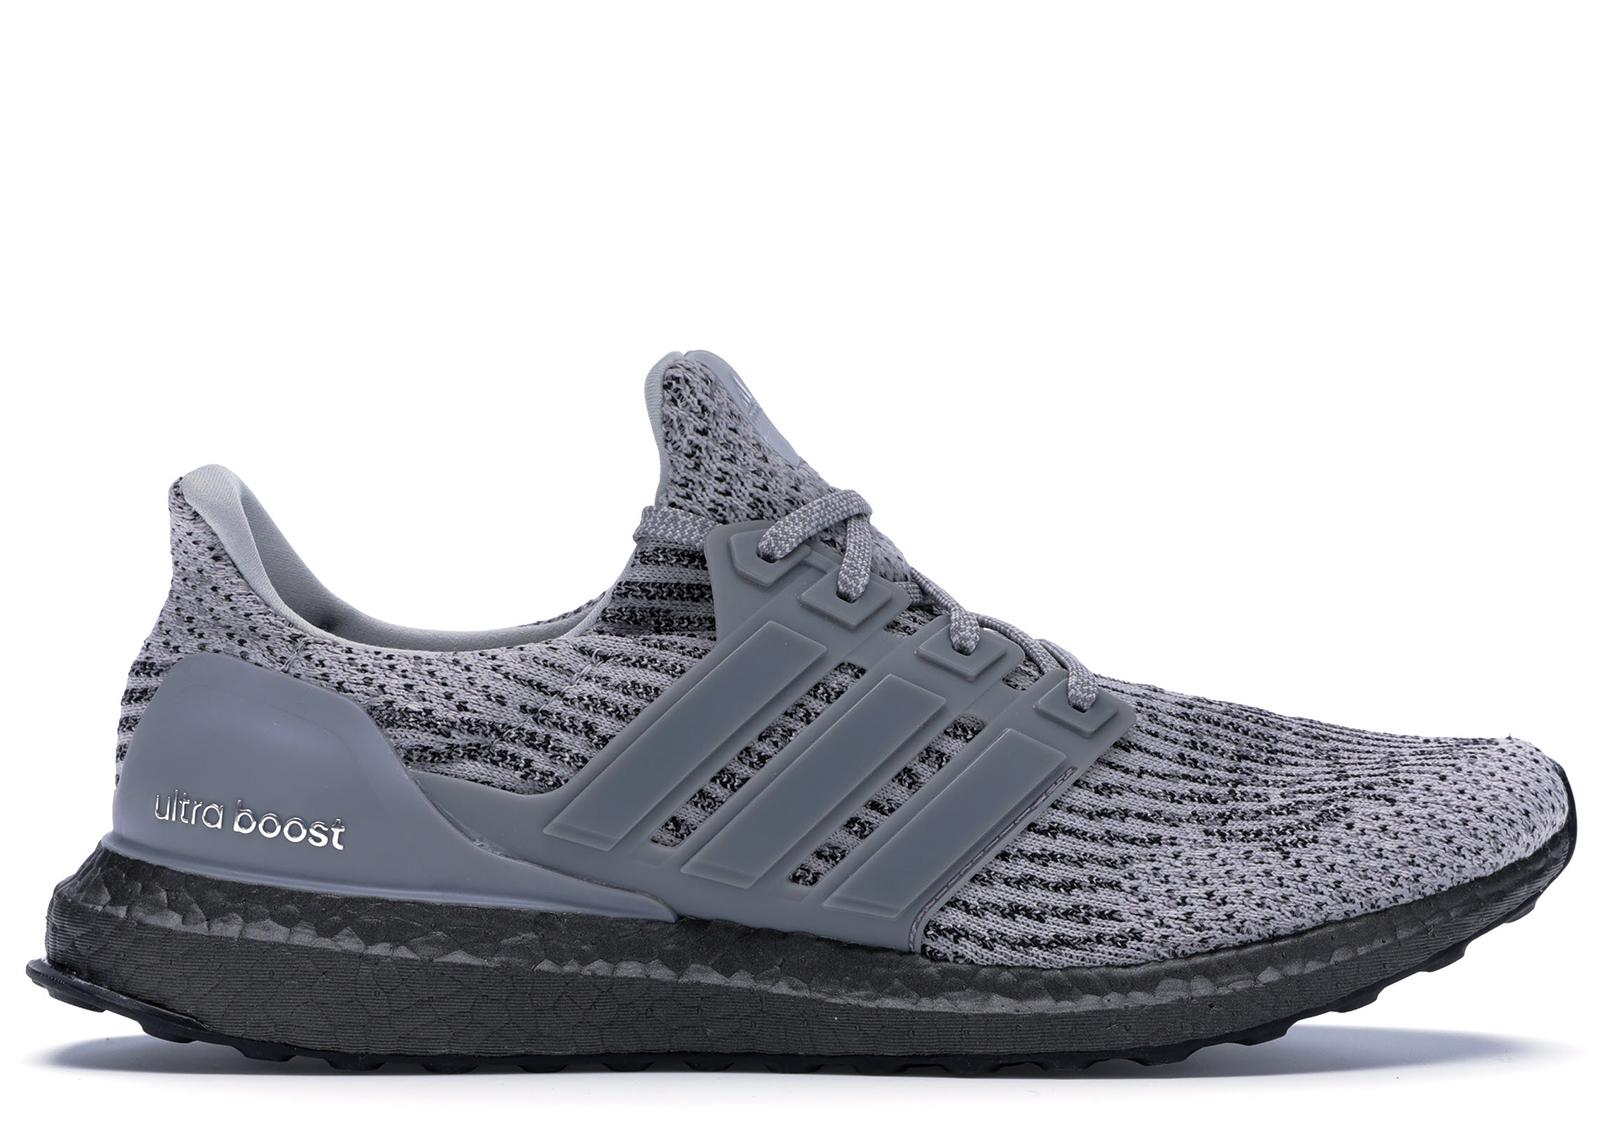 046661d4bb838 new zealand adidas ultra boost 3.0 triple grey cg3041 9ce08 99605